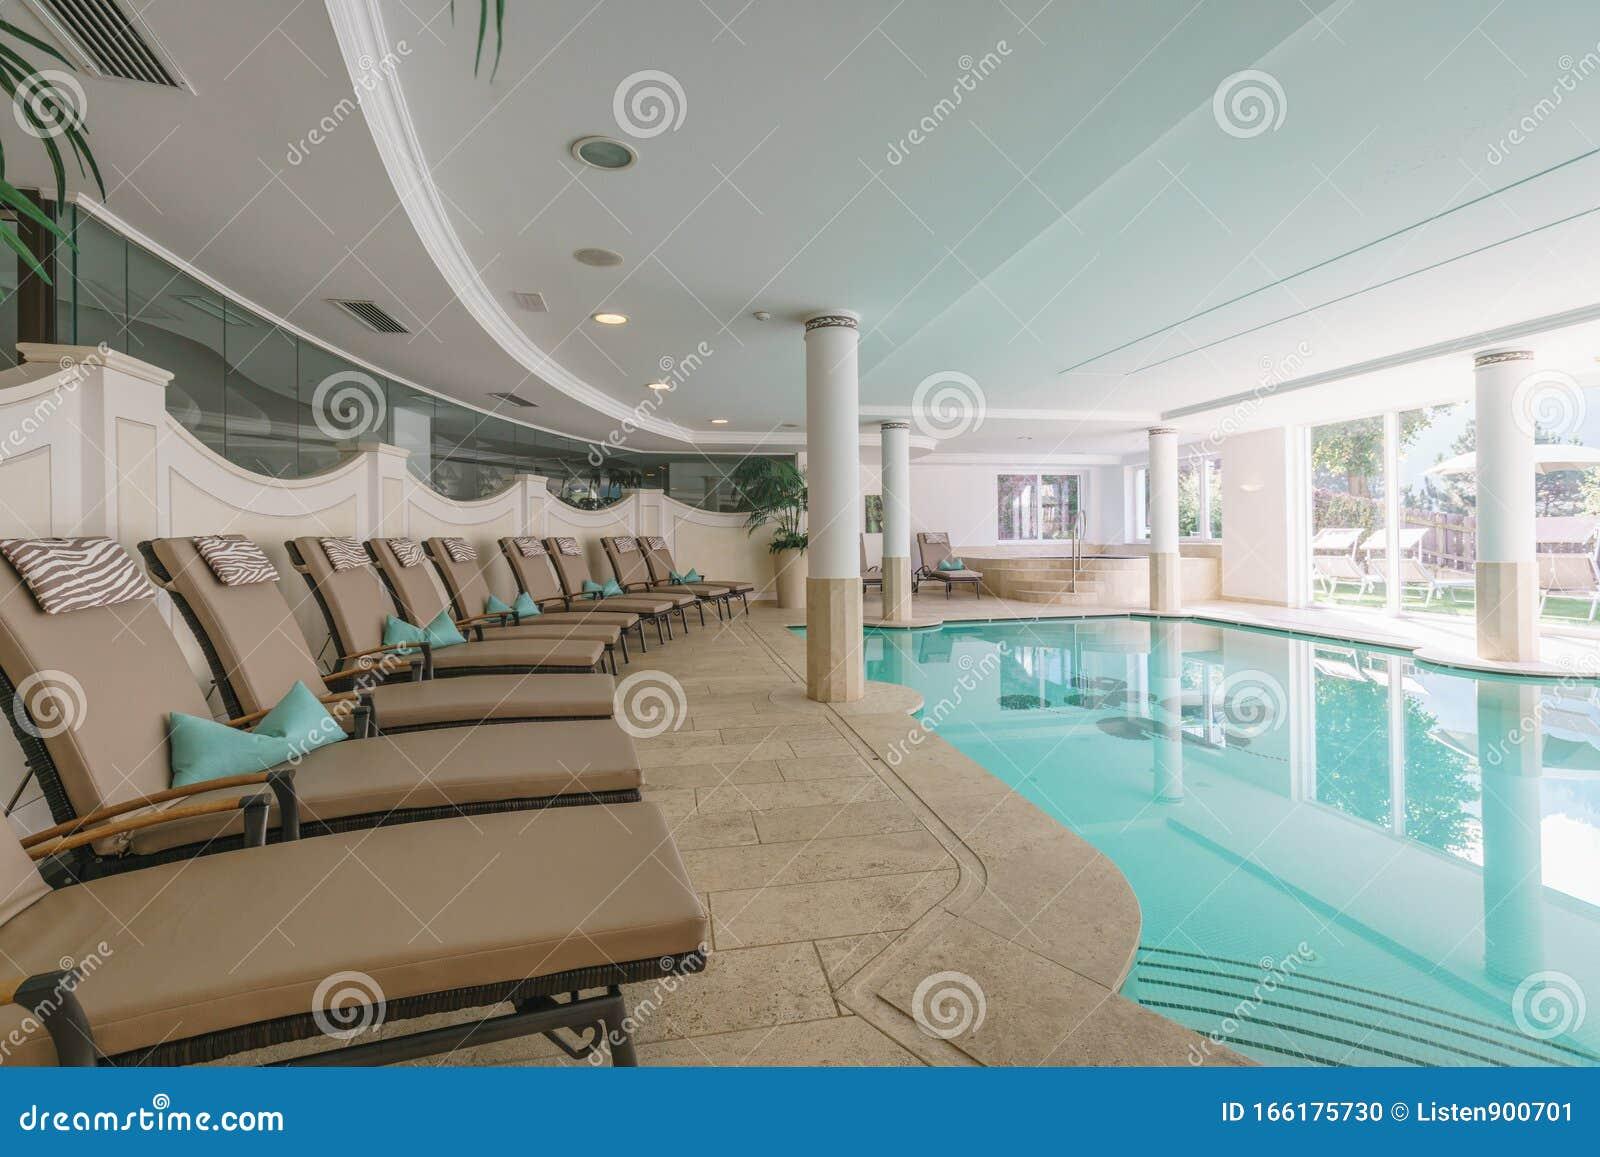 Indoor Swimming Pool In A Luxury Resort Stock Photo Image Of Ortisei Health 166175730